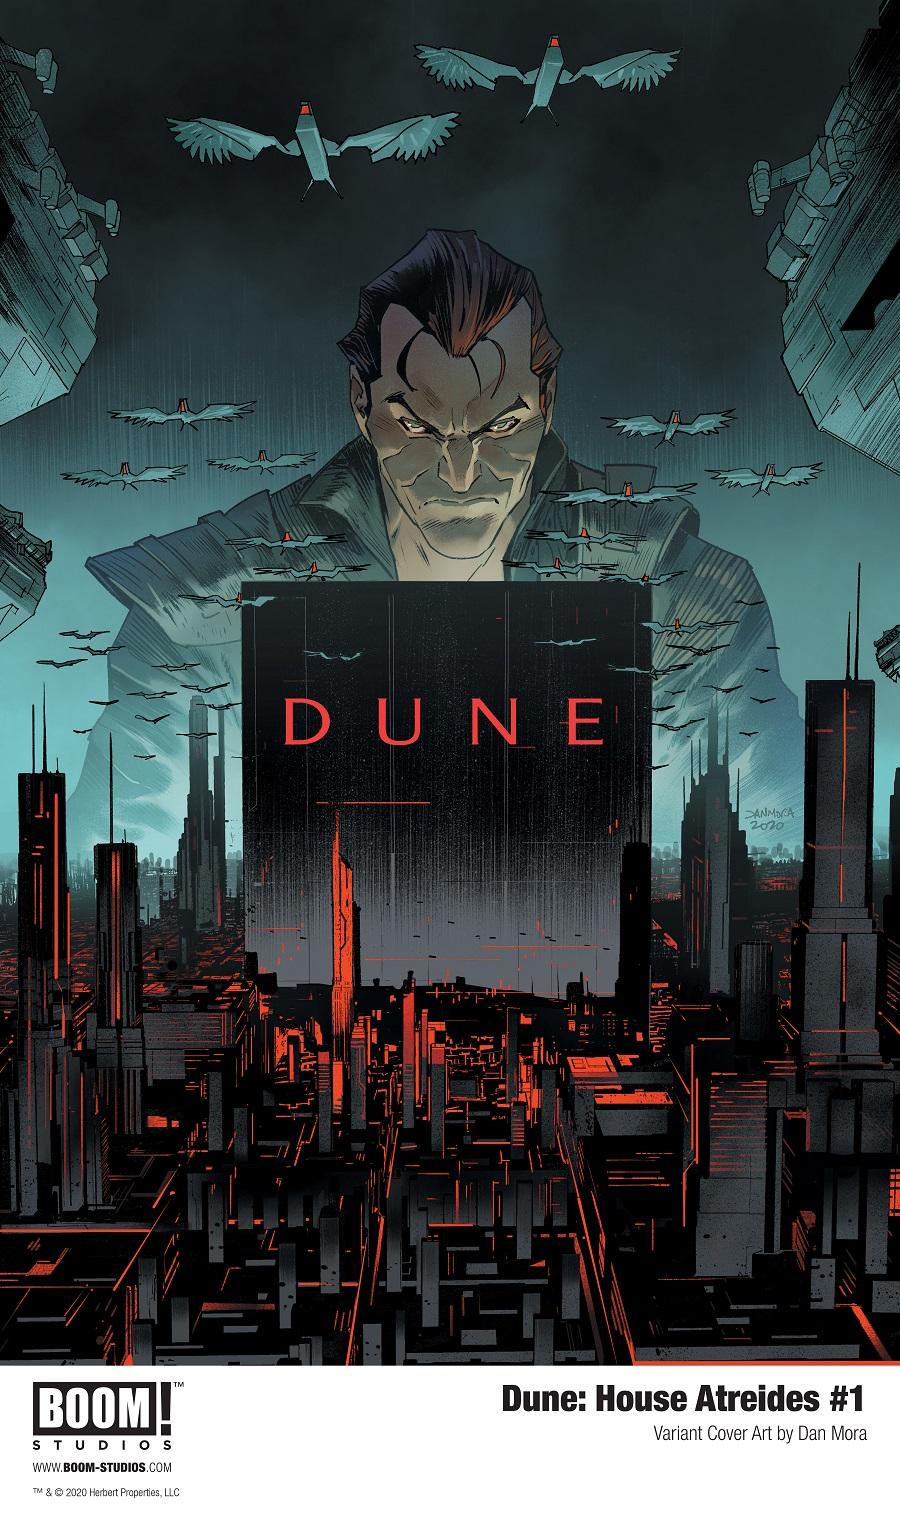 Dune-House-Atreides-issue-1-cover-by-Dan-Mora